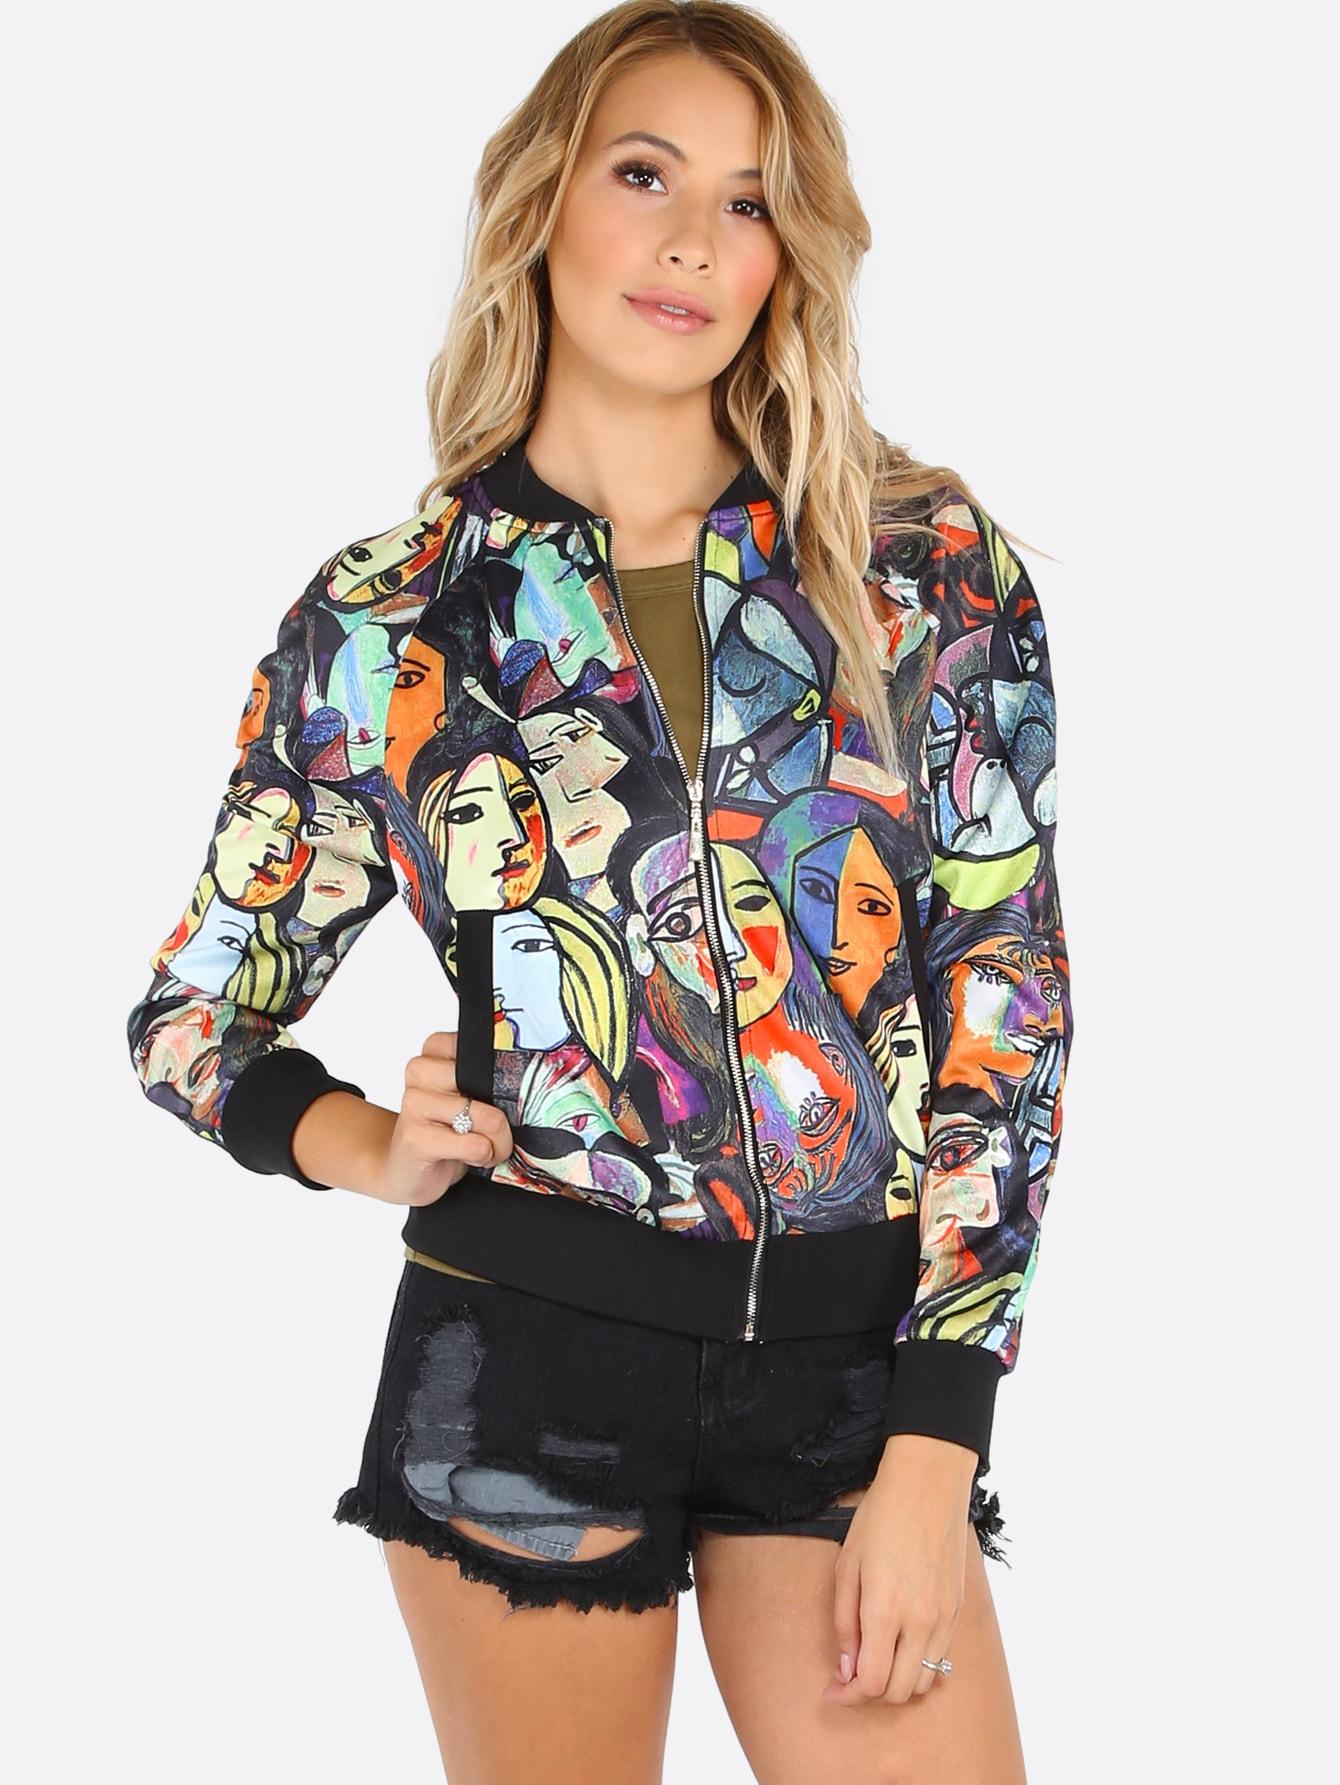 Multicolor Random Portrait Painting Print Bomber Jacket